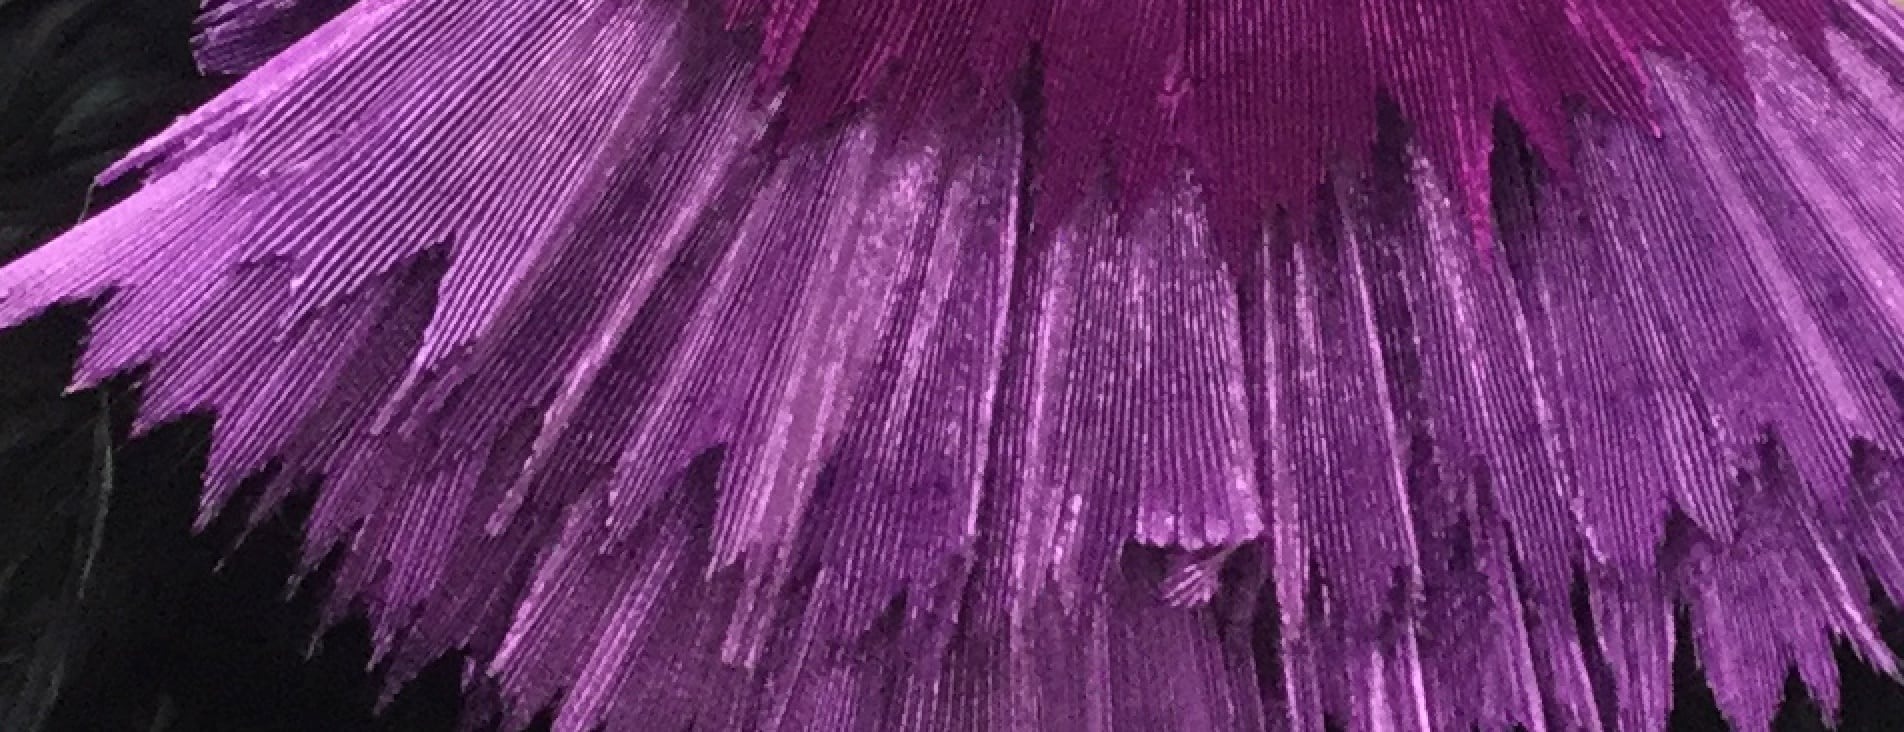 Cher purple fabric header image